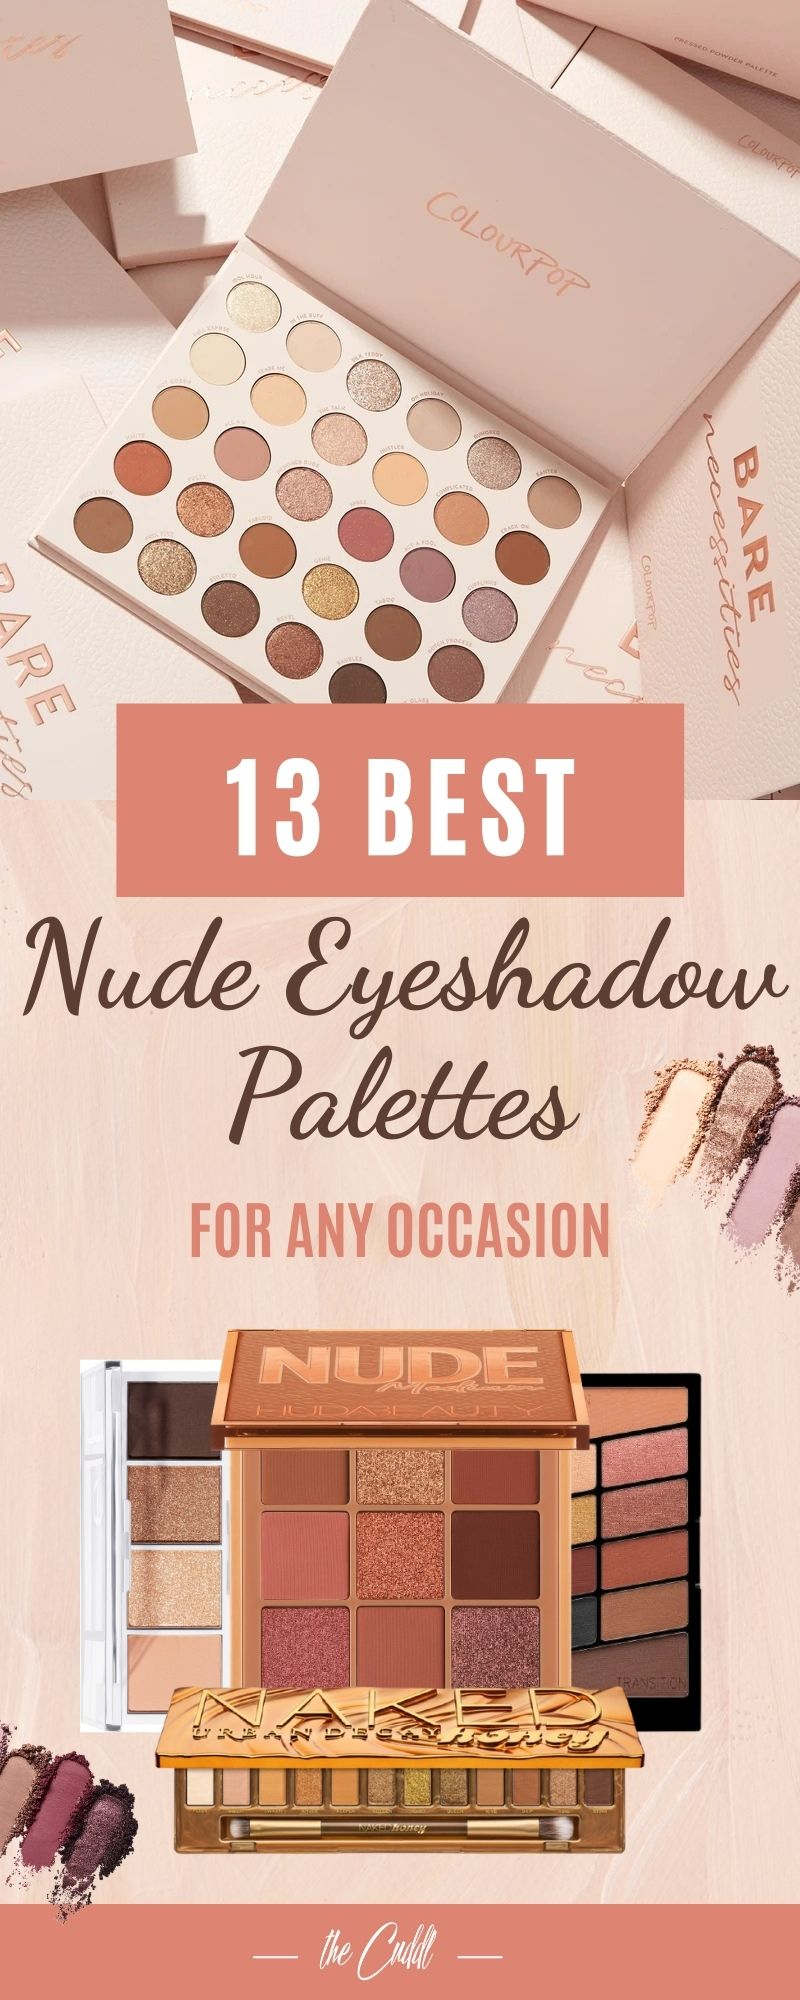 Best Nude Eyeshadow Palettes